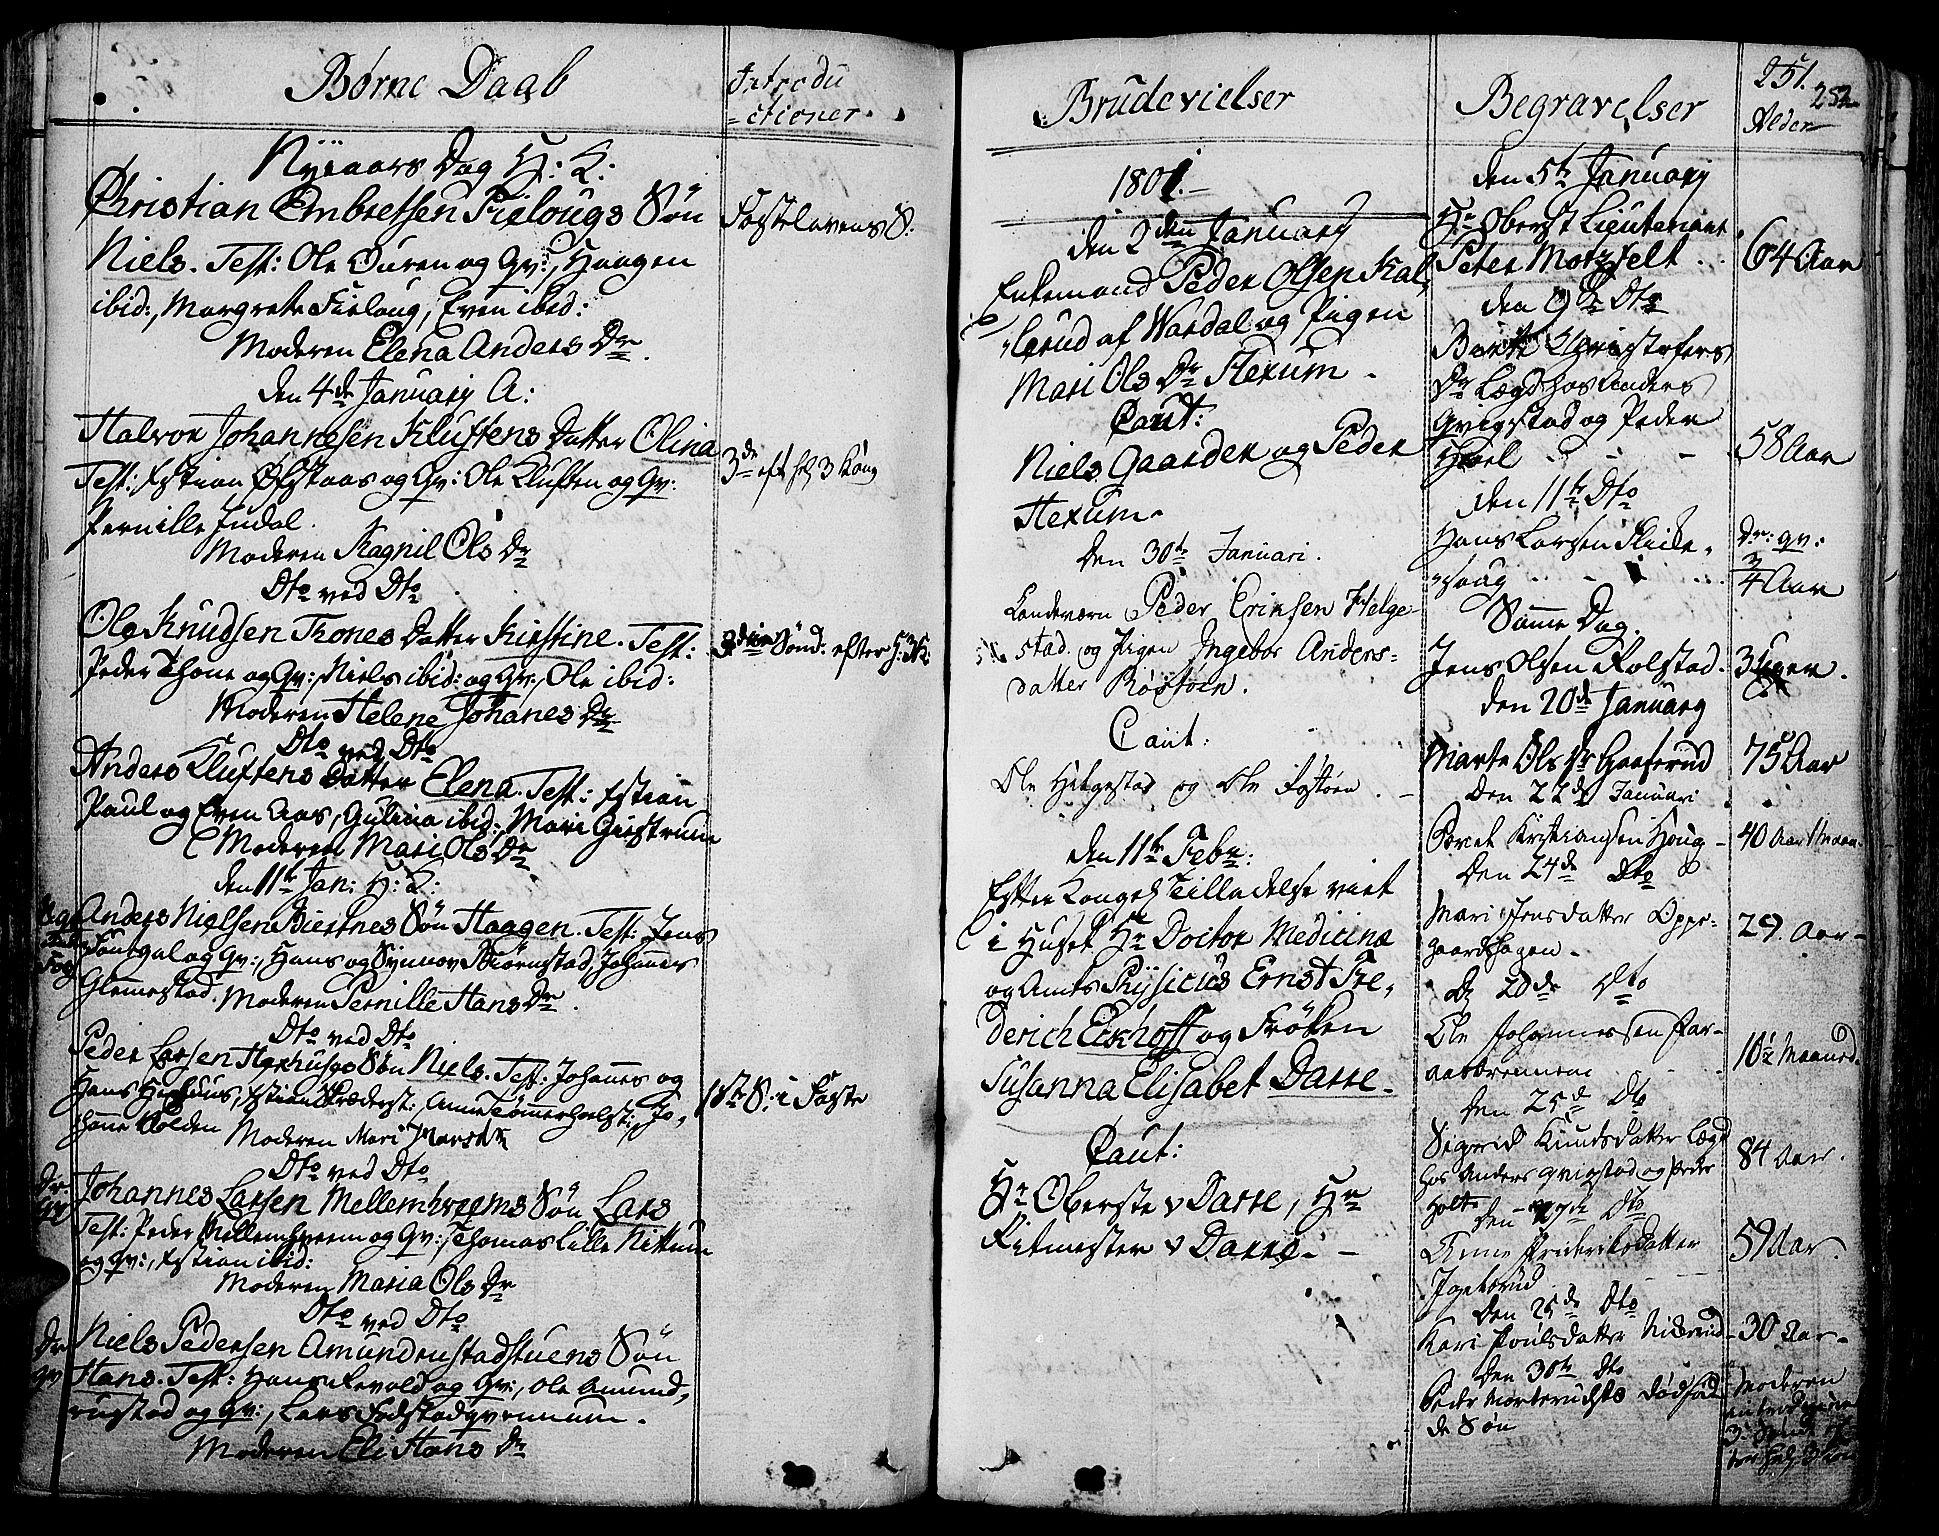 SAH, Toten prestekontor, Ministerialbok nr. 7, 1794-1809, s. 252